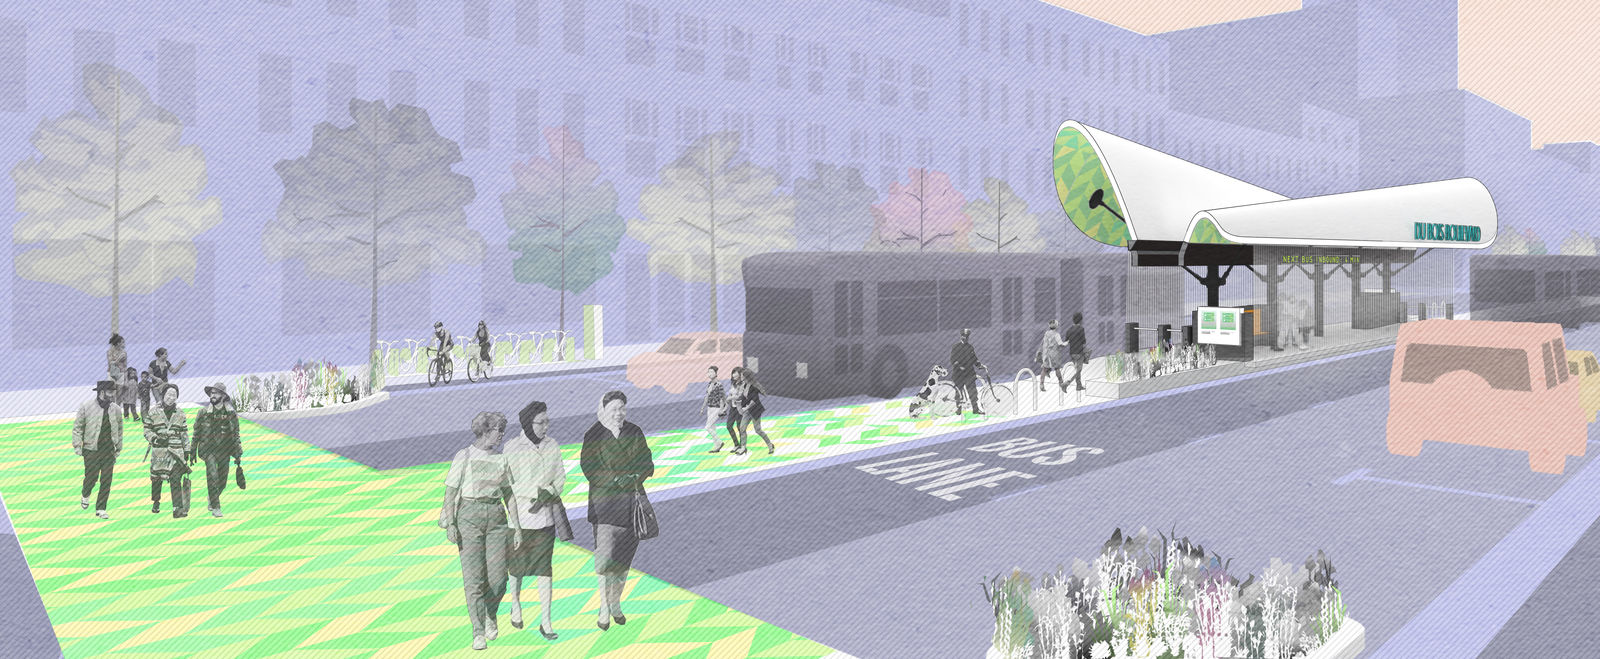 BostonBRT Station Design Entry by Utile